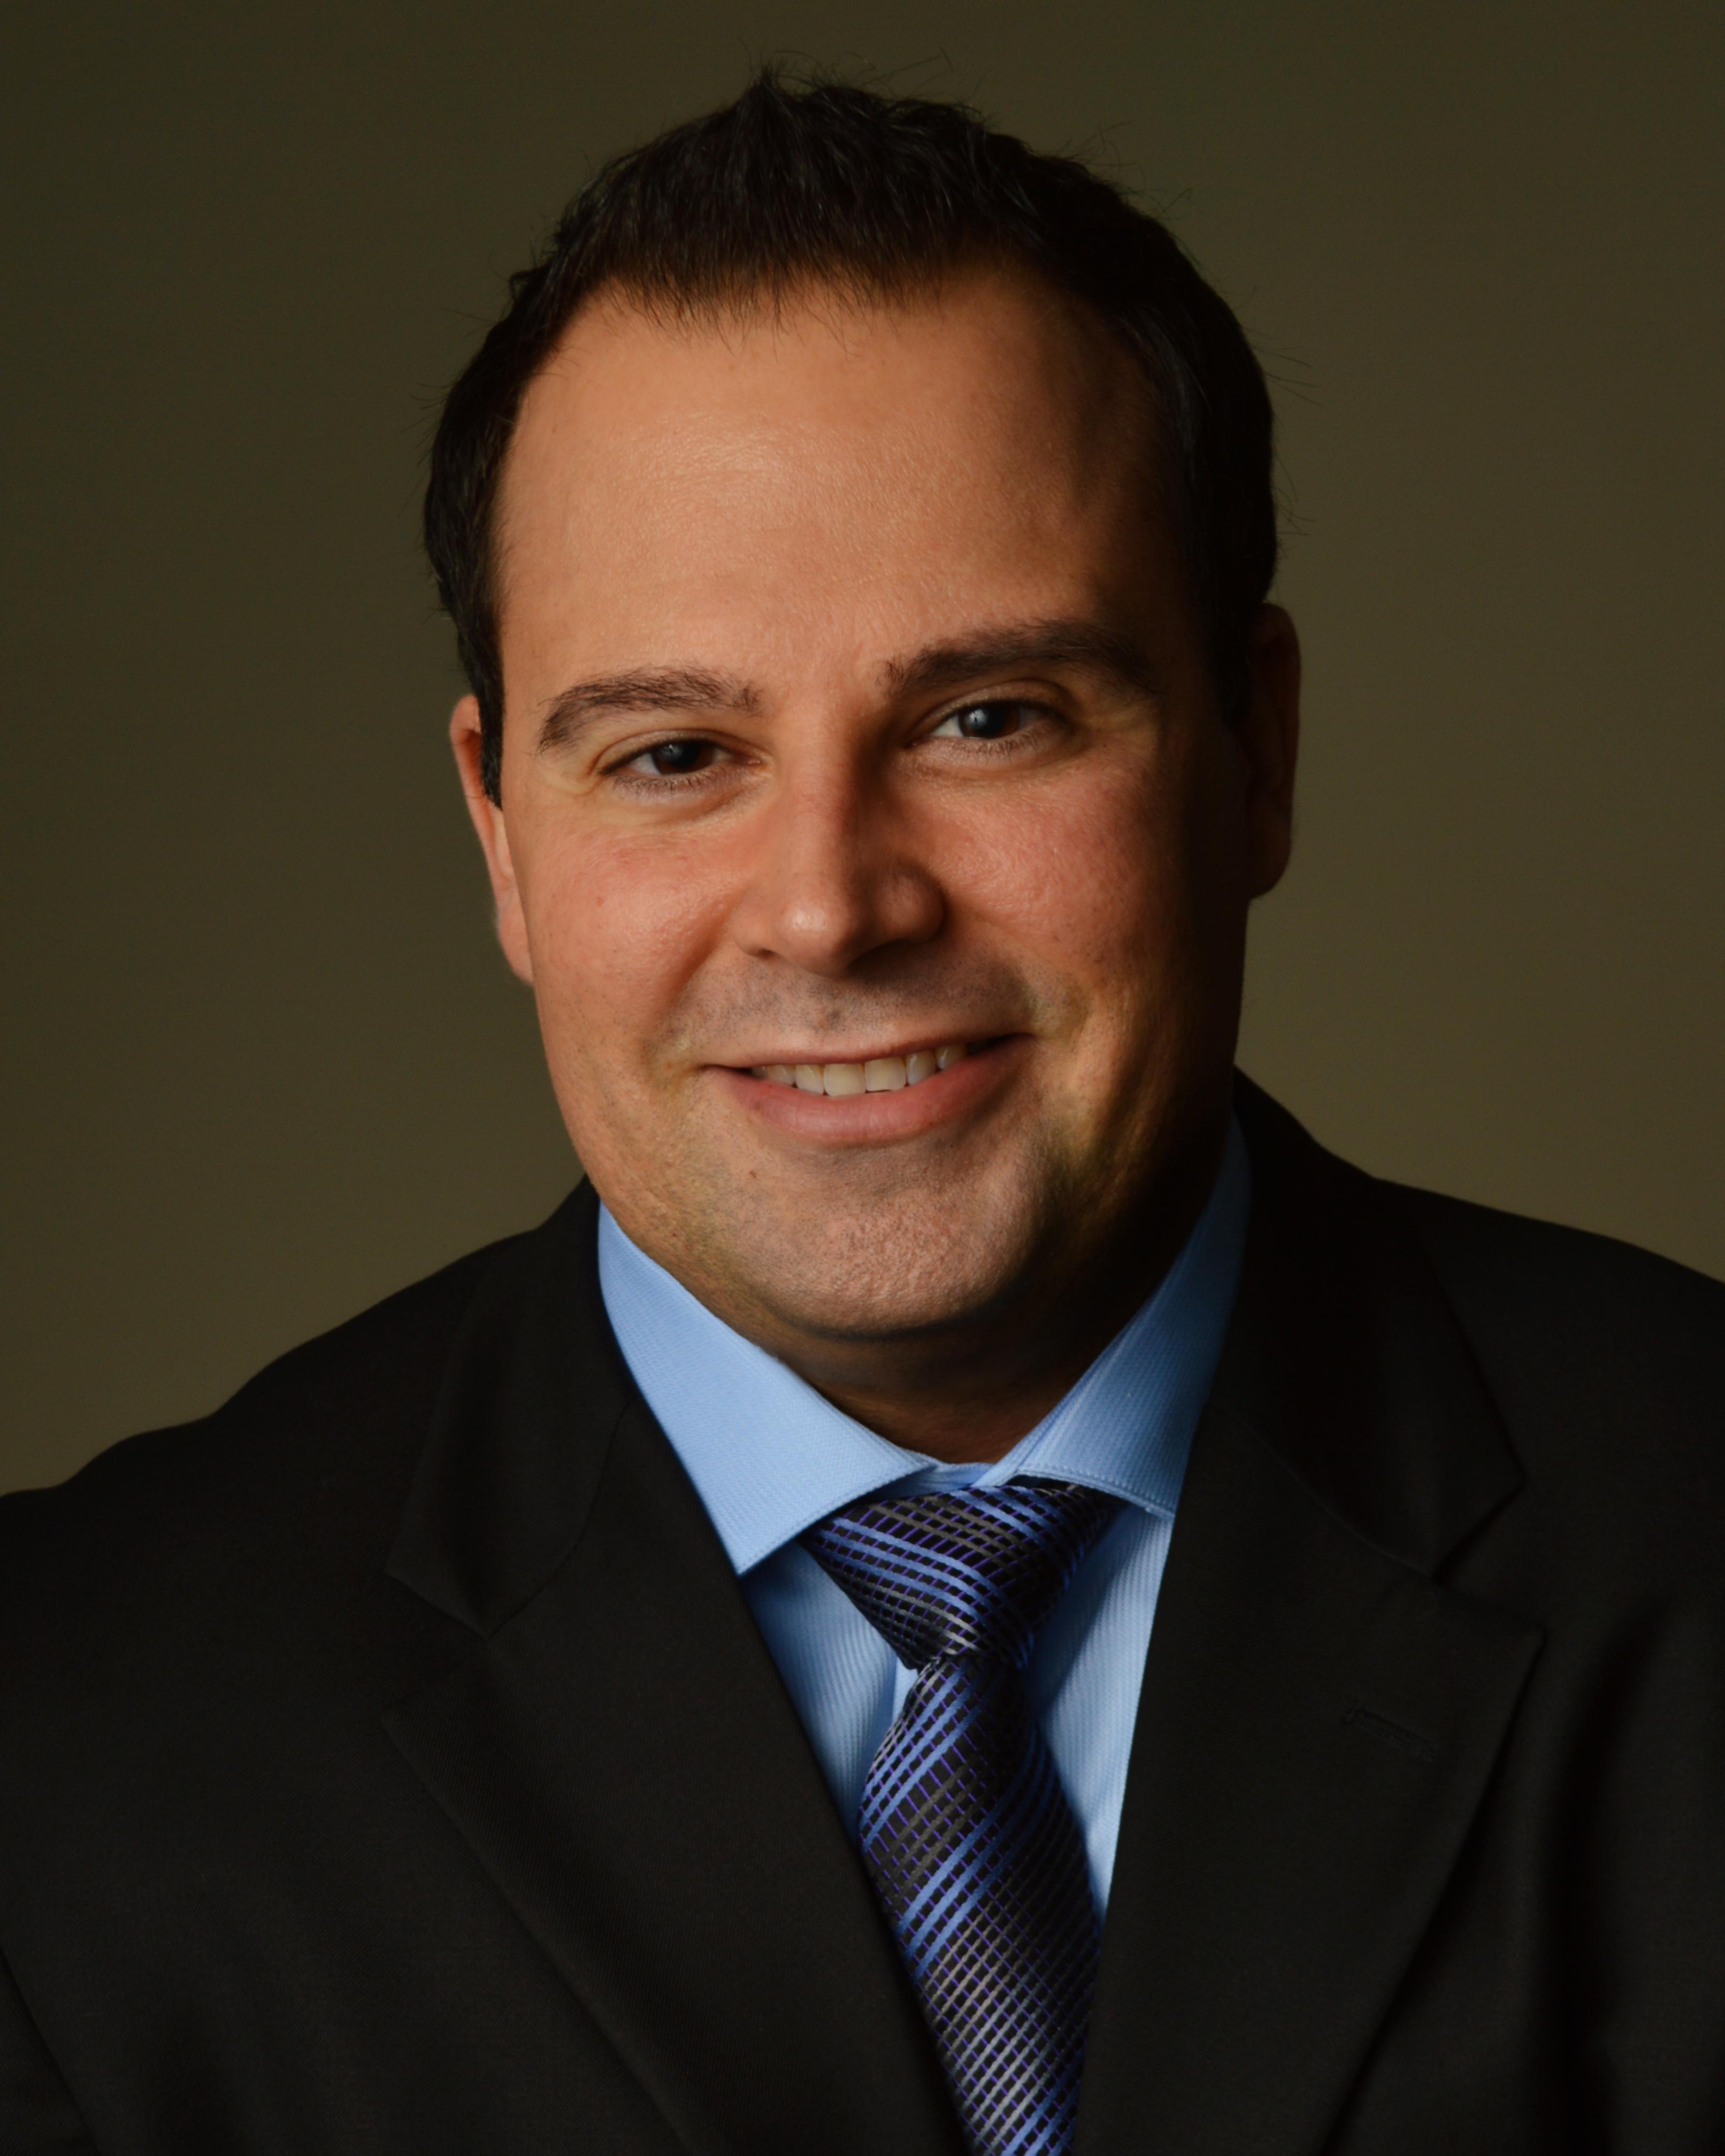 Dr. Michael Jurgelewicz